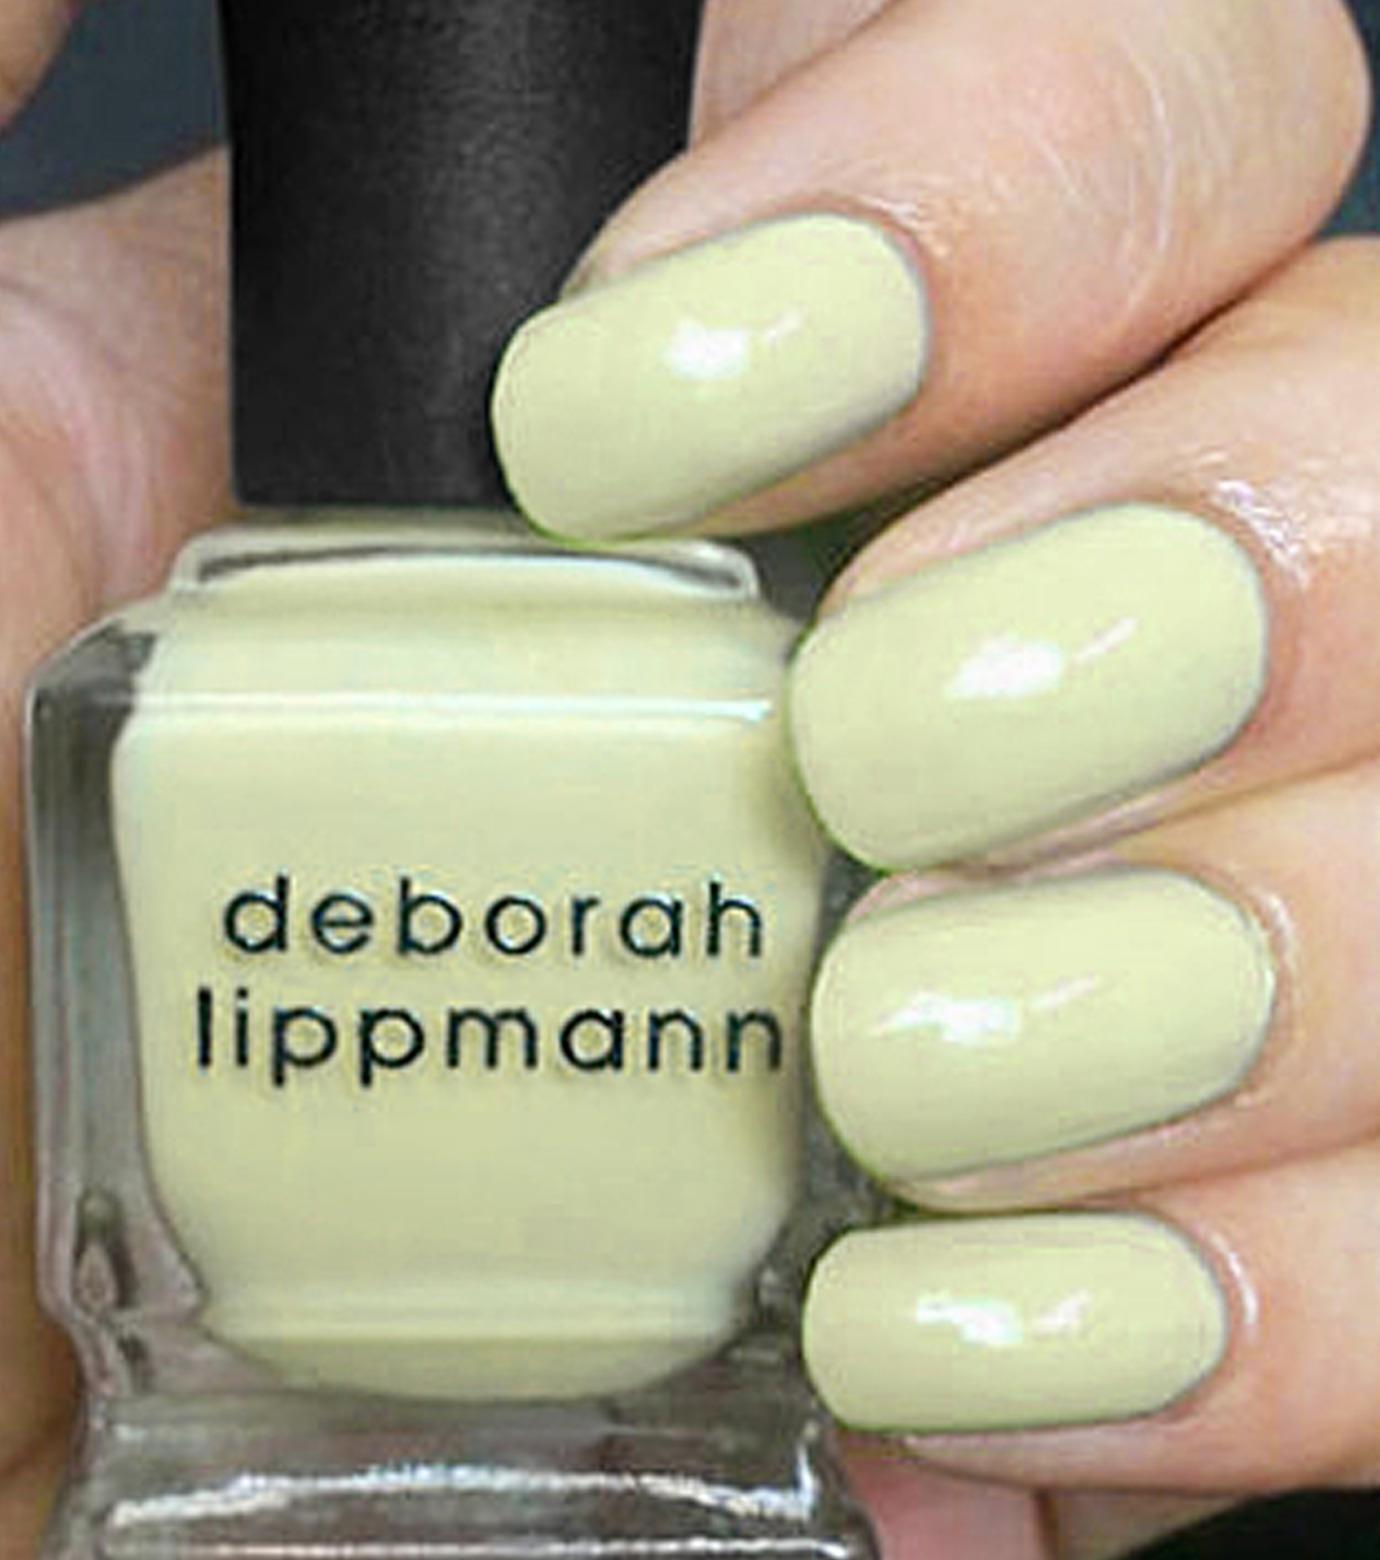 Deborah Lippmann(デボラリップマン)のSpring Buds-LIGHT GREEN(MAKE-UP/MAKE-UP)-20265-21 拡大詳細画像2